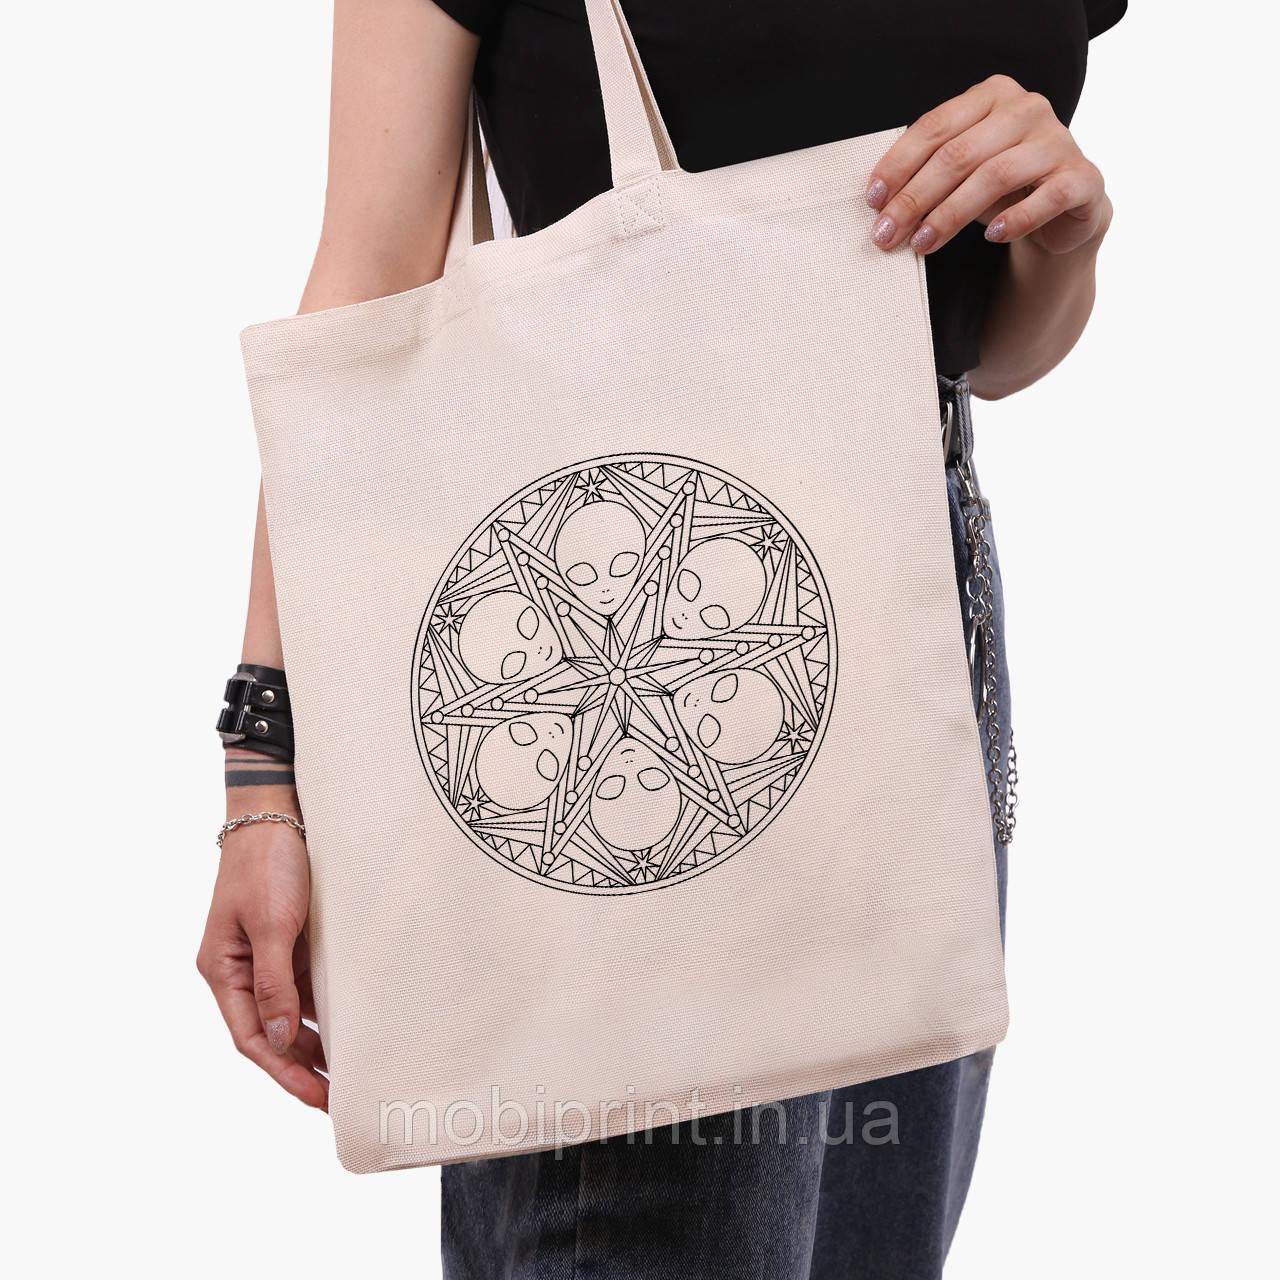 Еко сумка шоппер Инопланетяни (Aliens) (9227-2852) 41*35 см